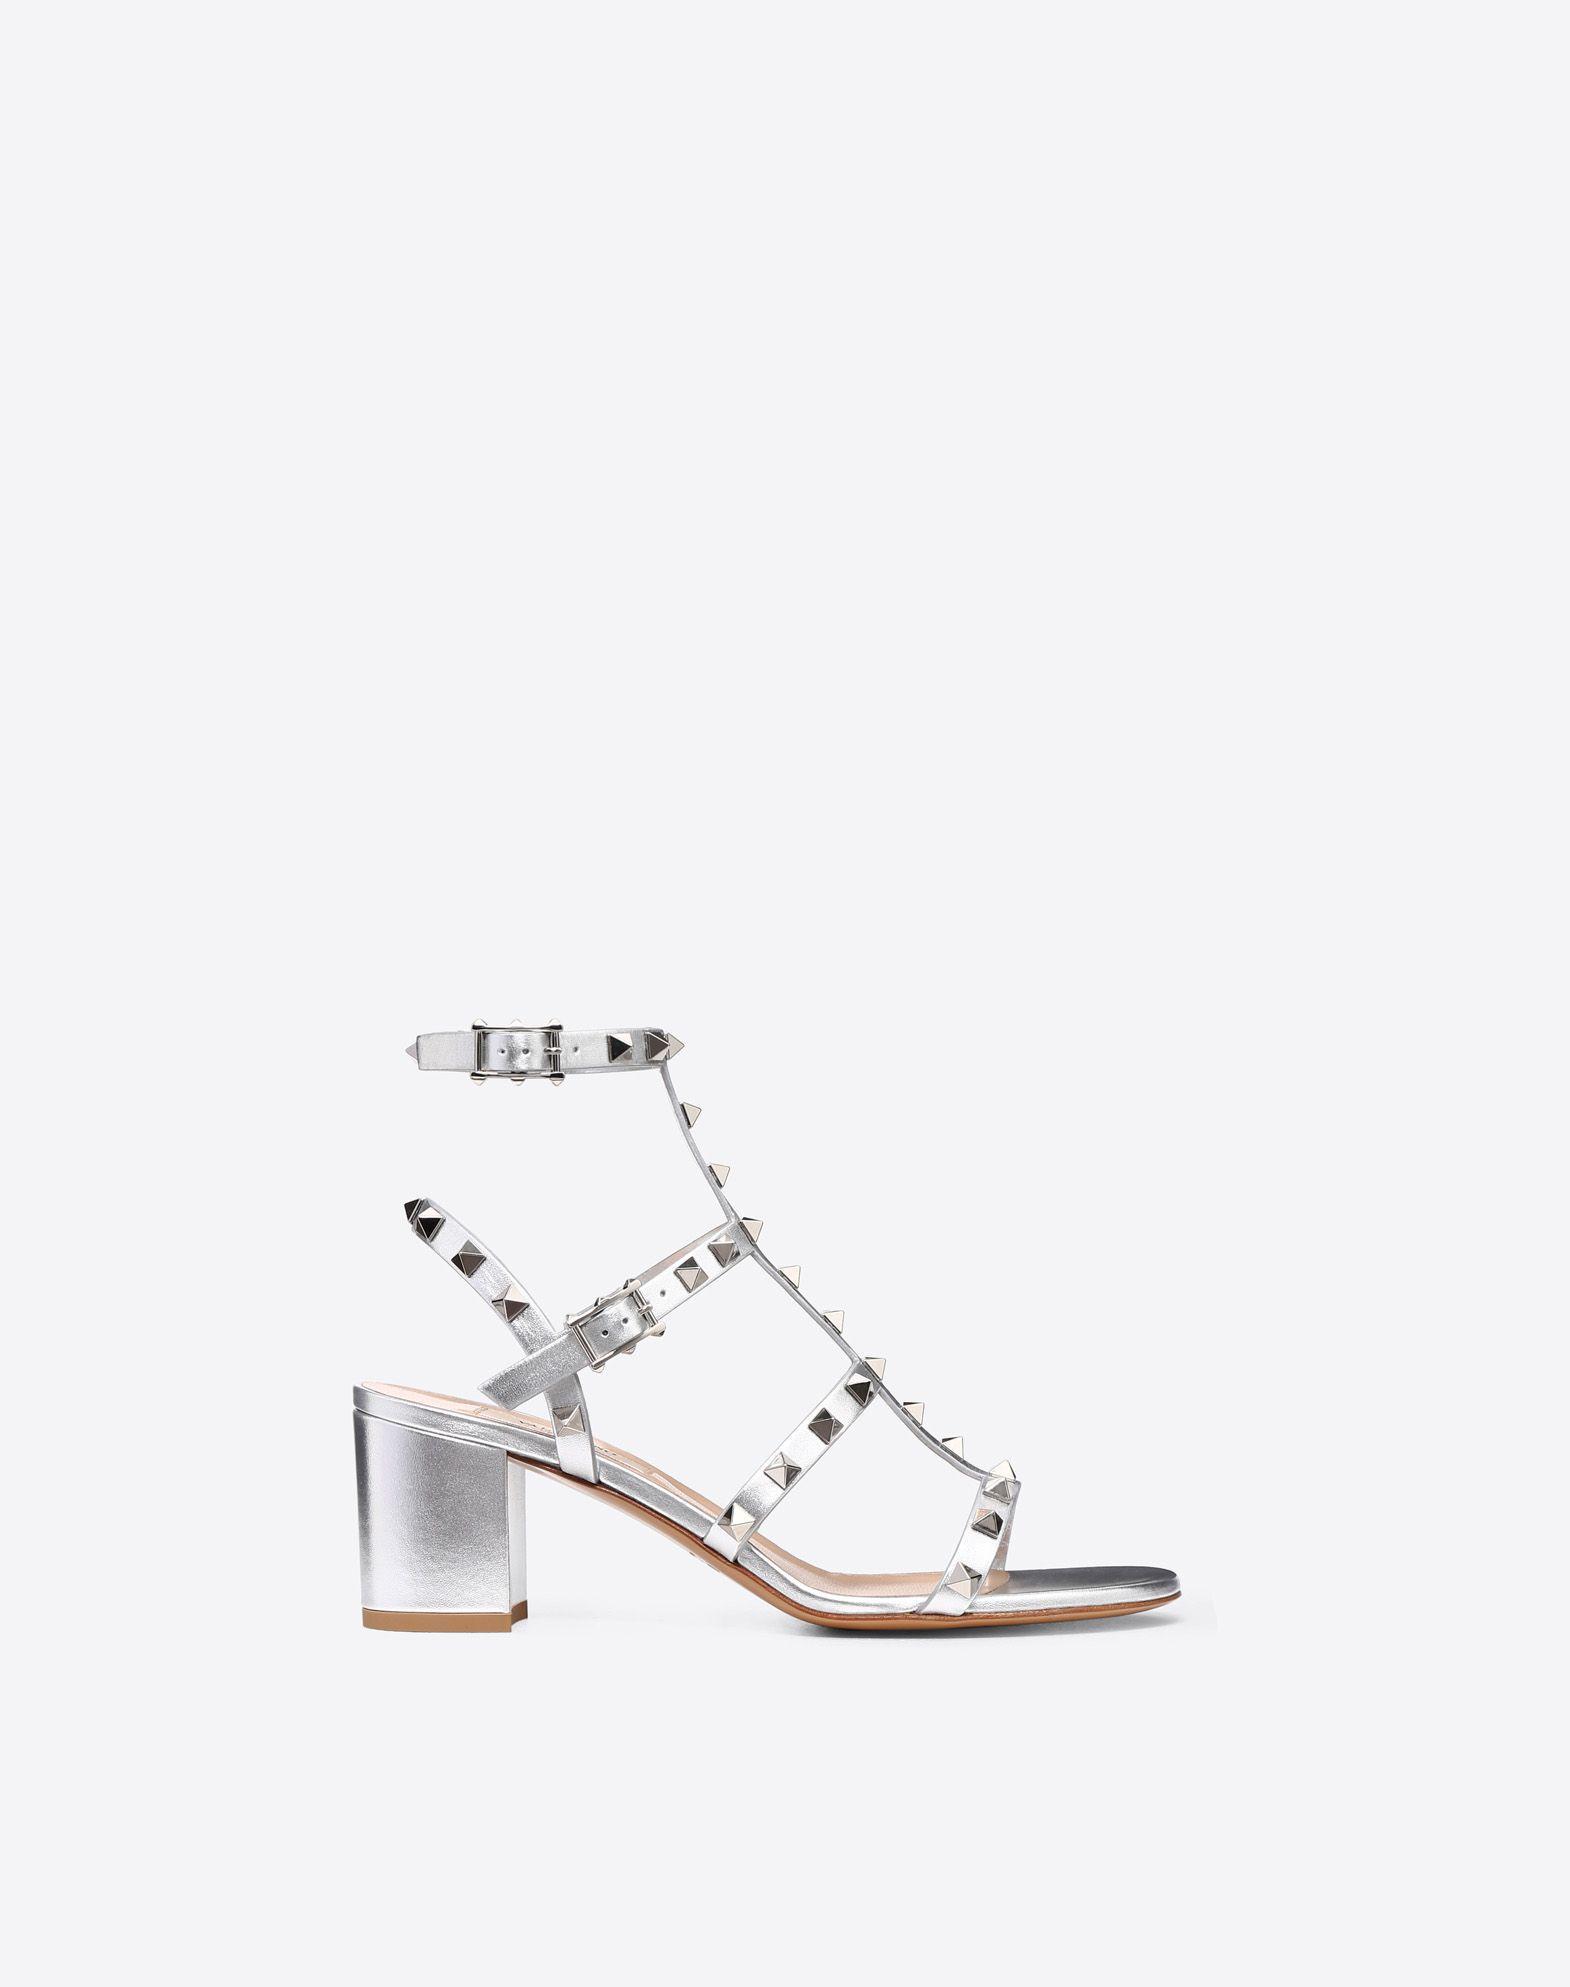 bf048c04fd63 Valentino Rockstud Metallic Ankle Strap Sandal 60Mm In Silver